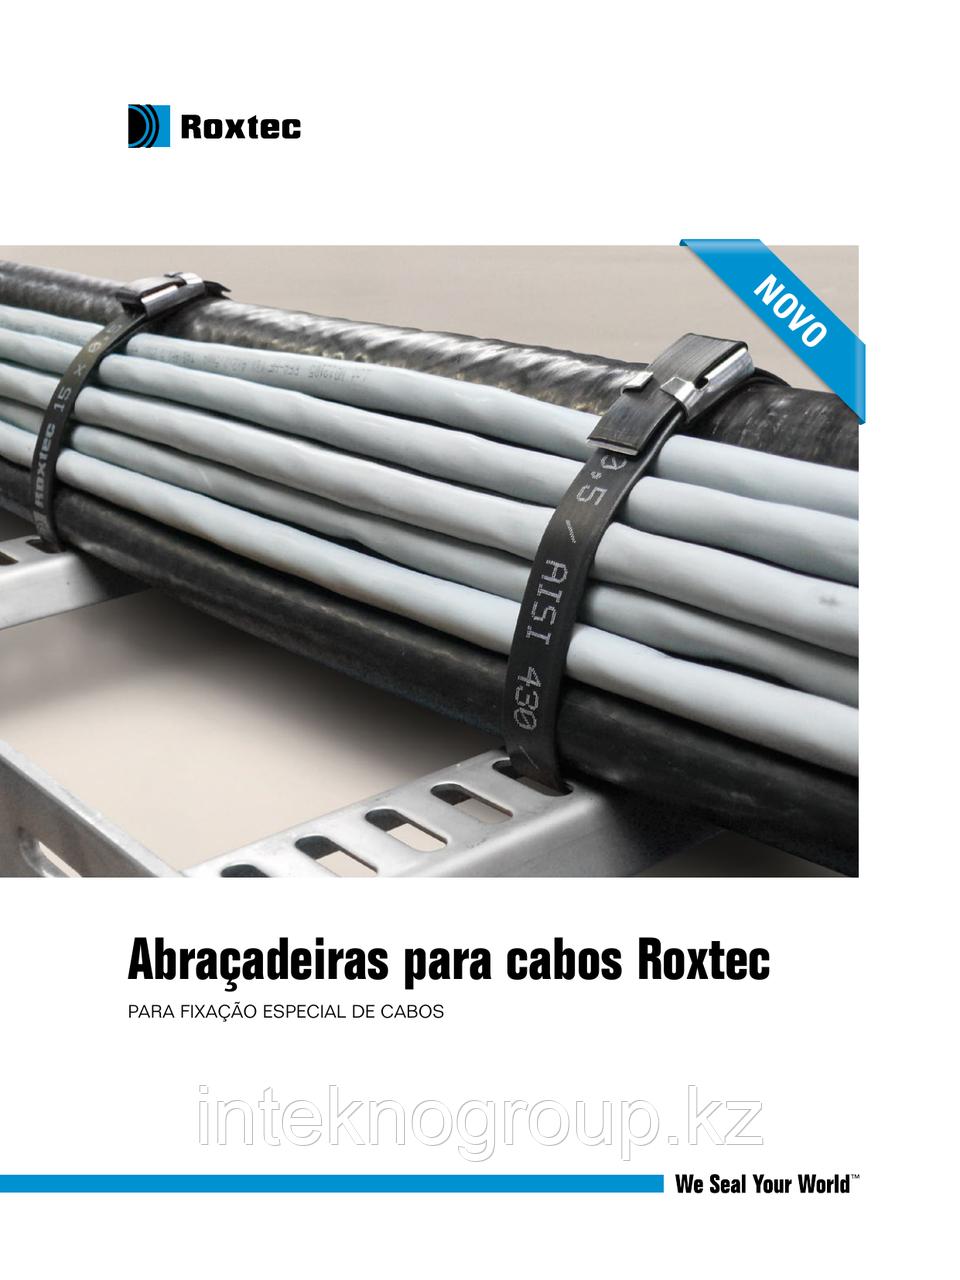 Roxtec Cable straps Strap 15x0,5 black/ss. L=500 mm